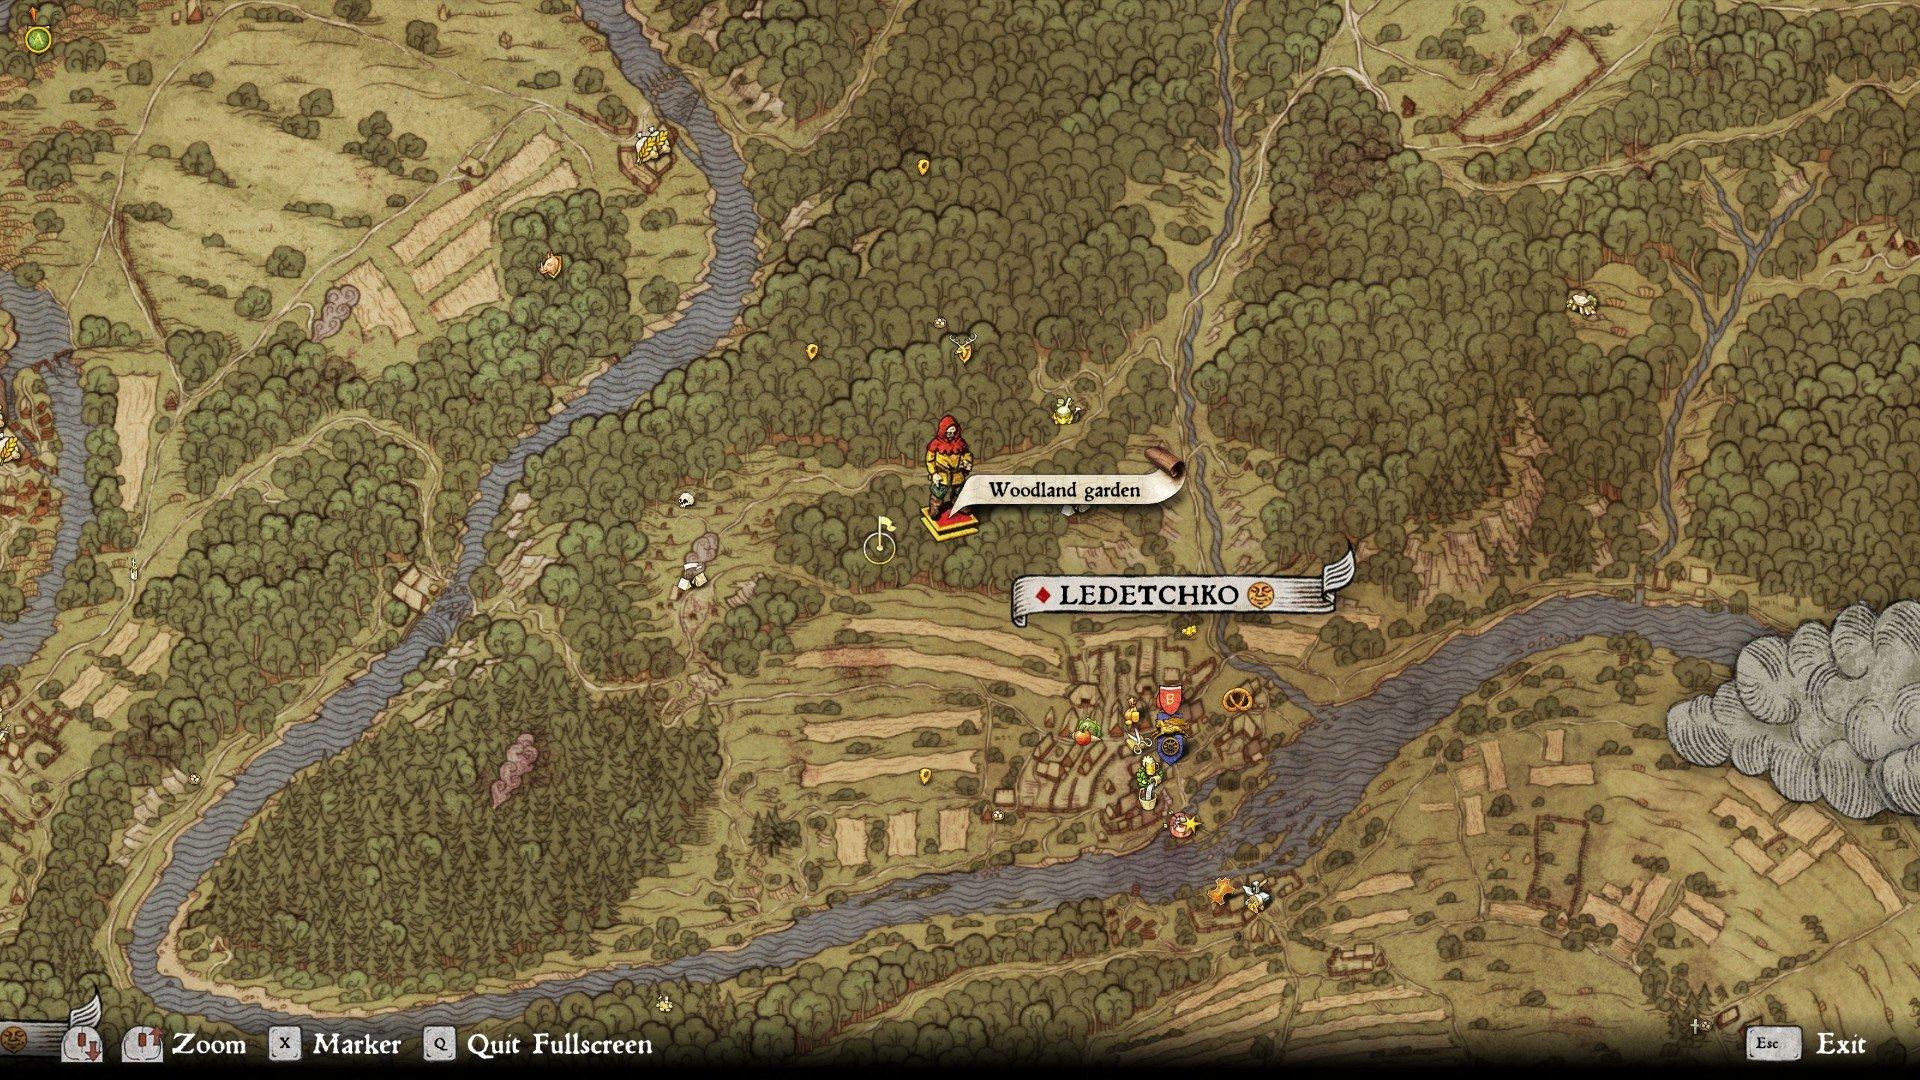 St. George\'s Sword | Kingdom Come deliverance Wiki